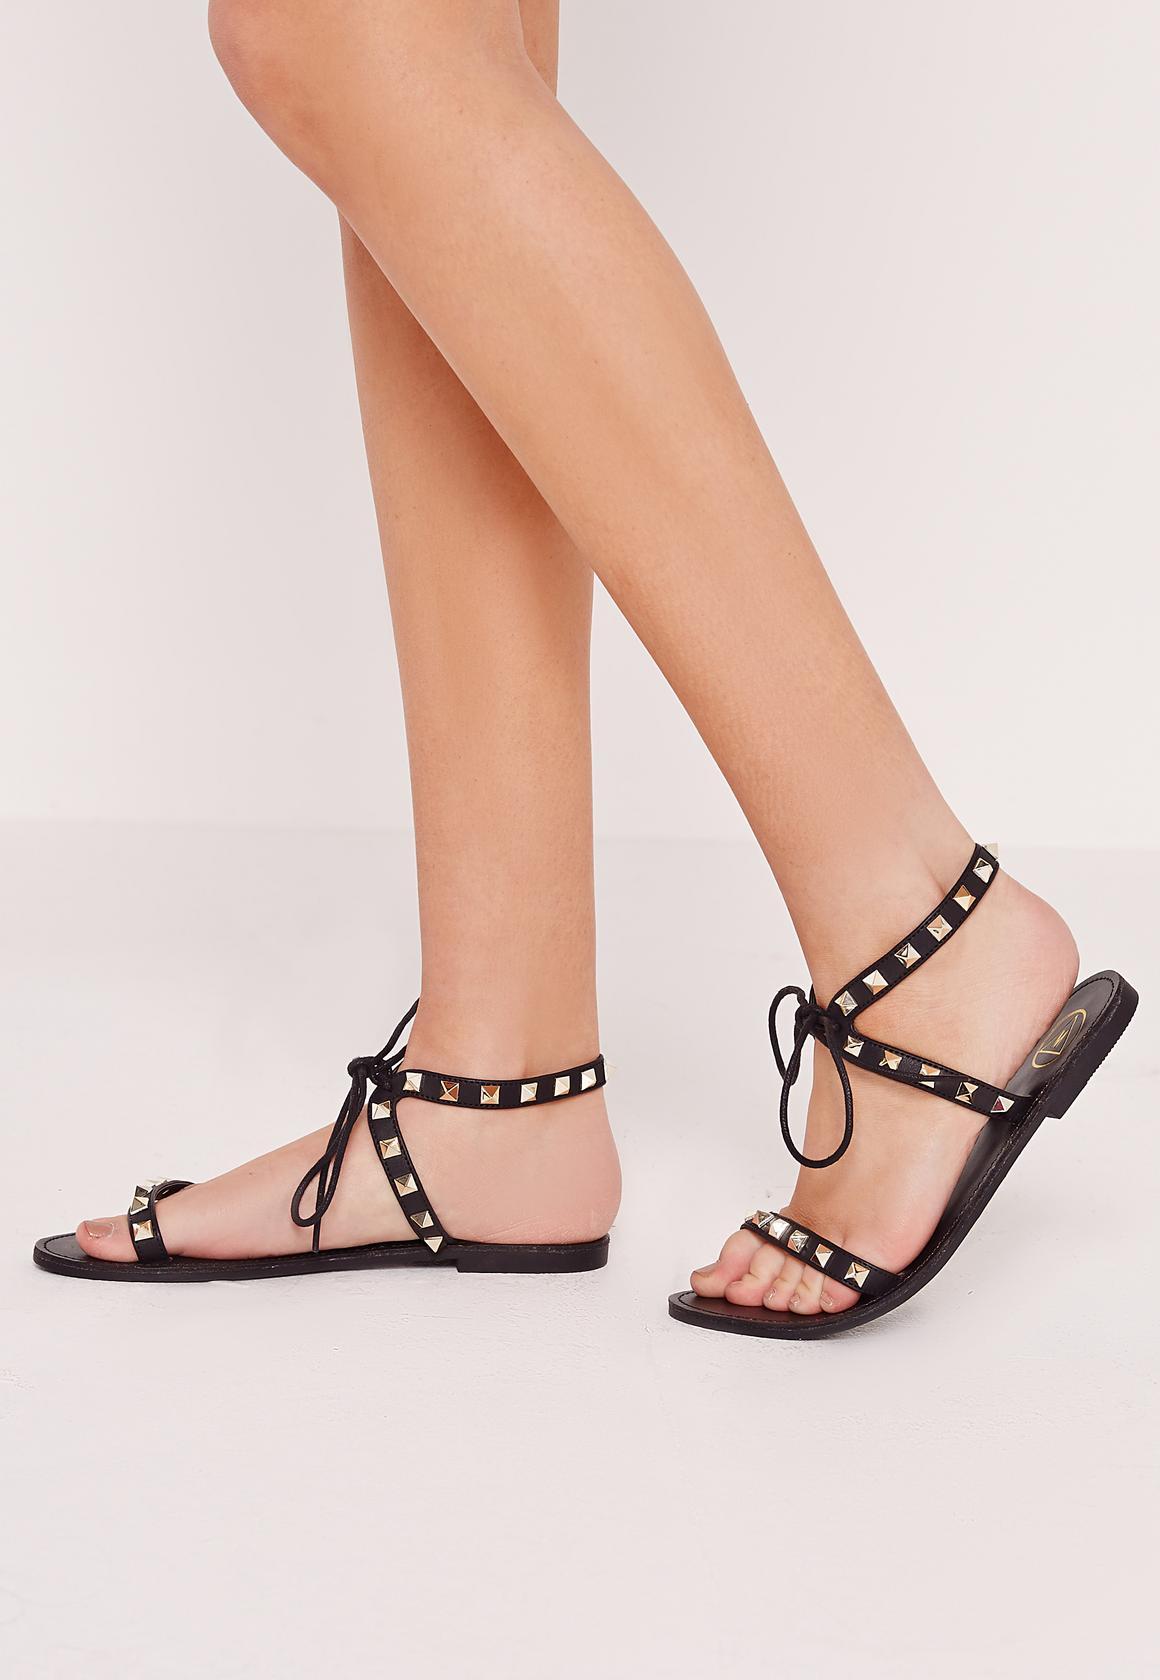 Flat sandals - Previous Next